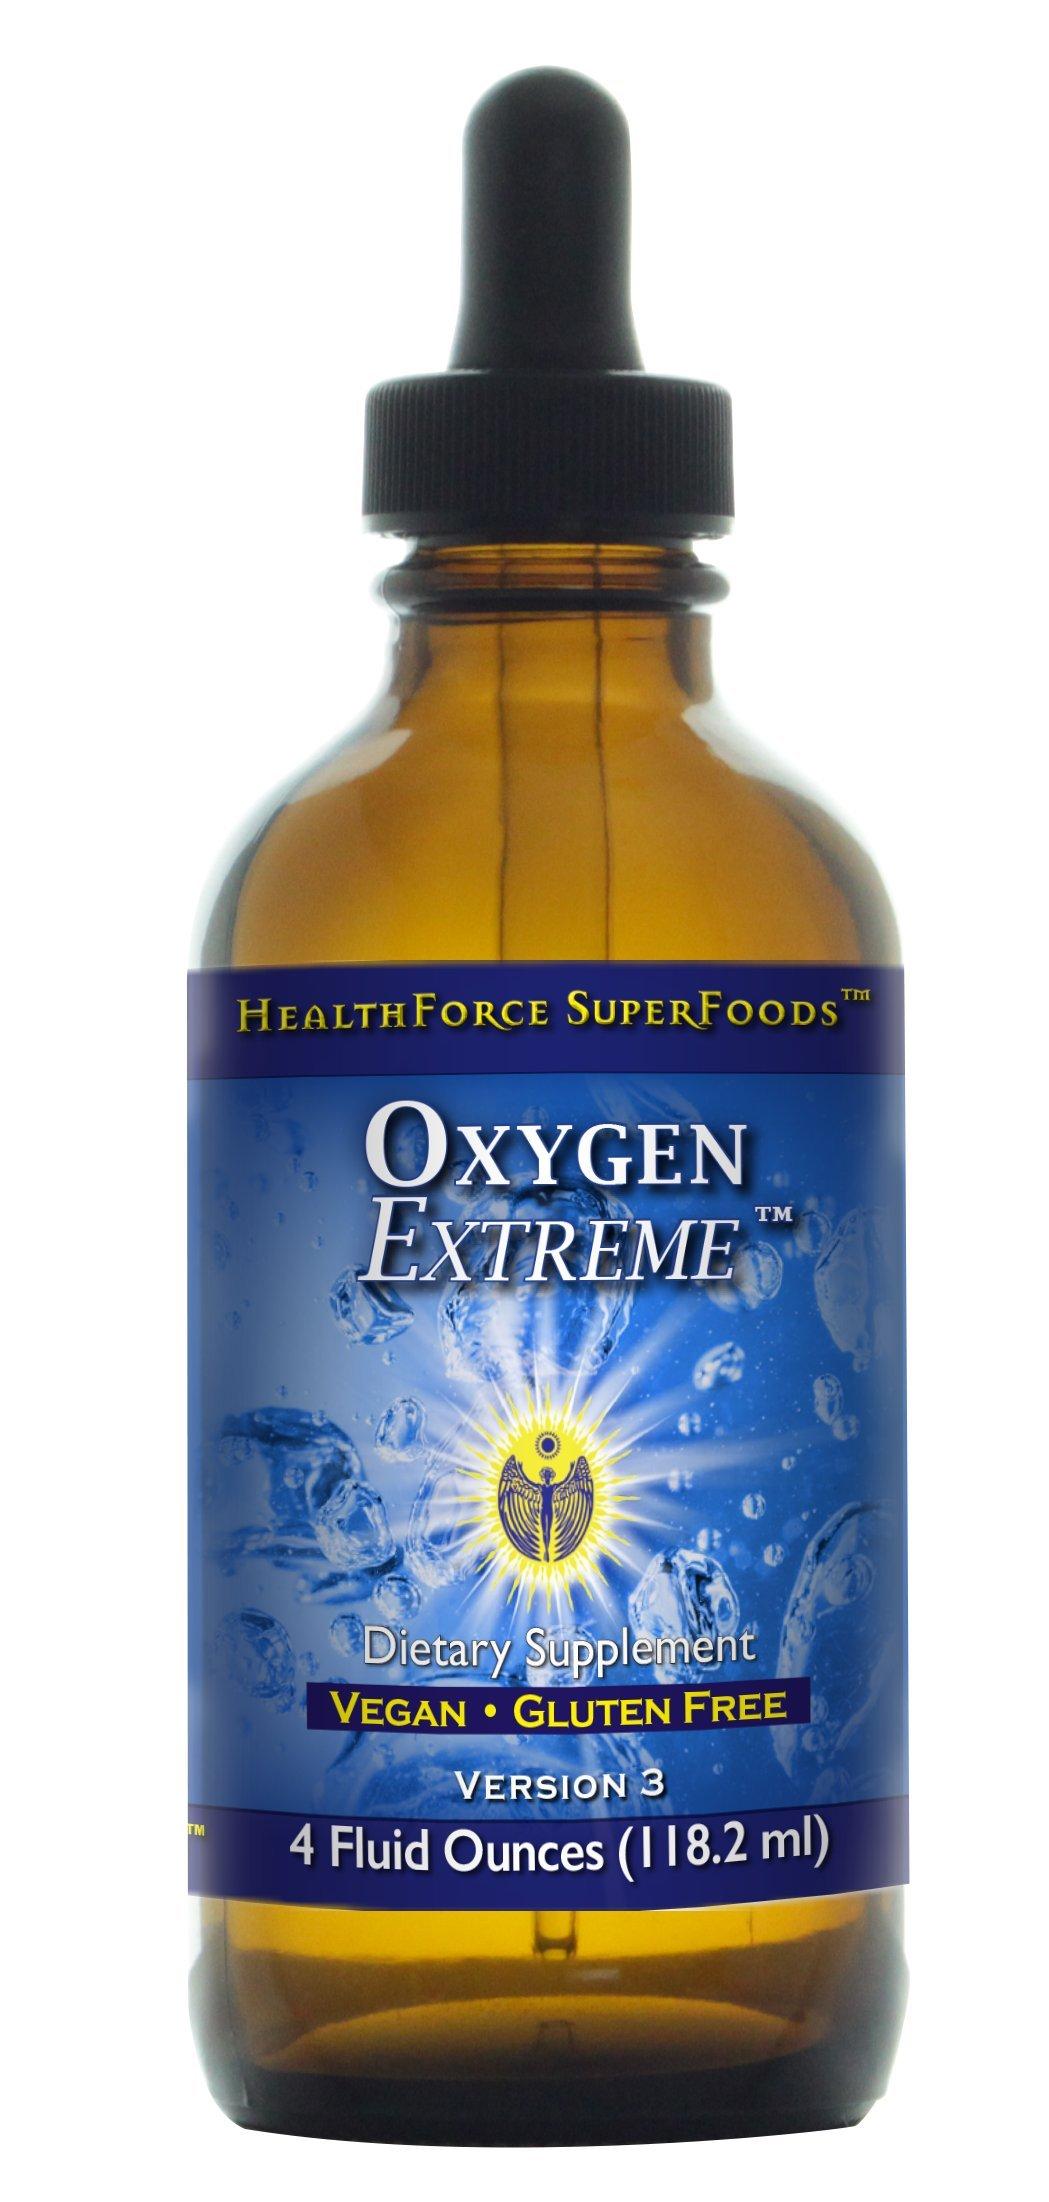 HealthForce SuperFoods Oxygen Extreme 4 Ounces Liquid